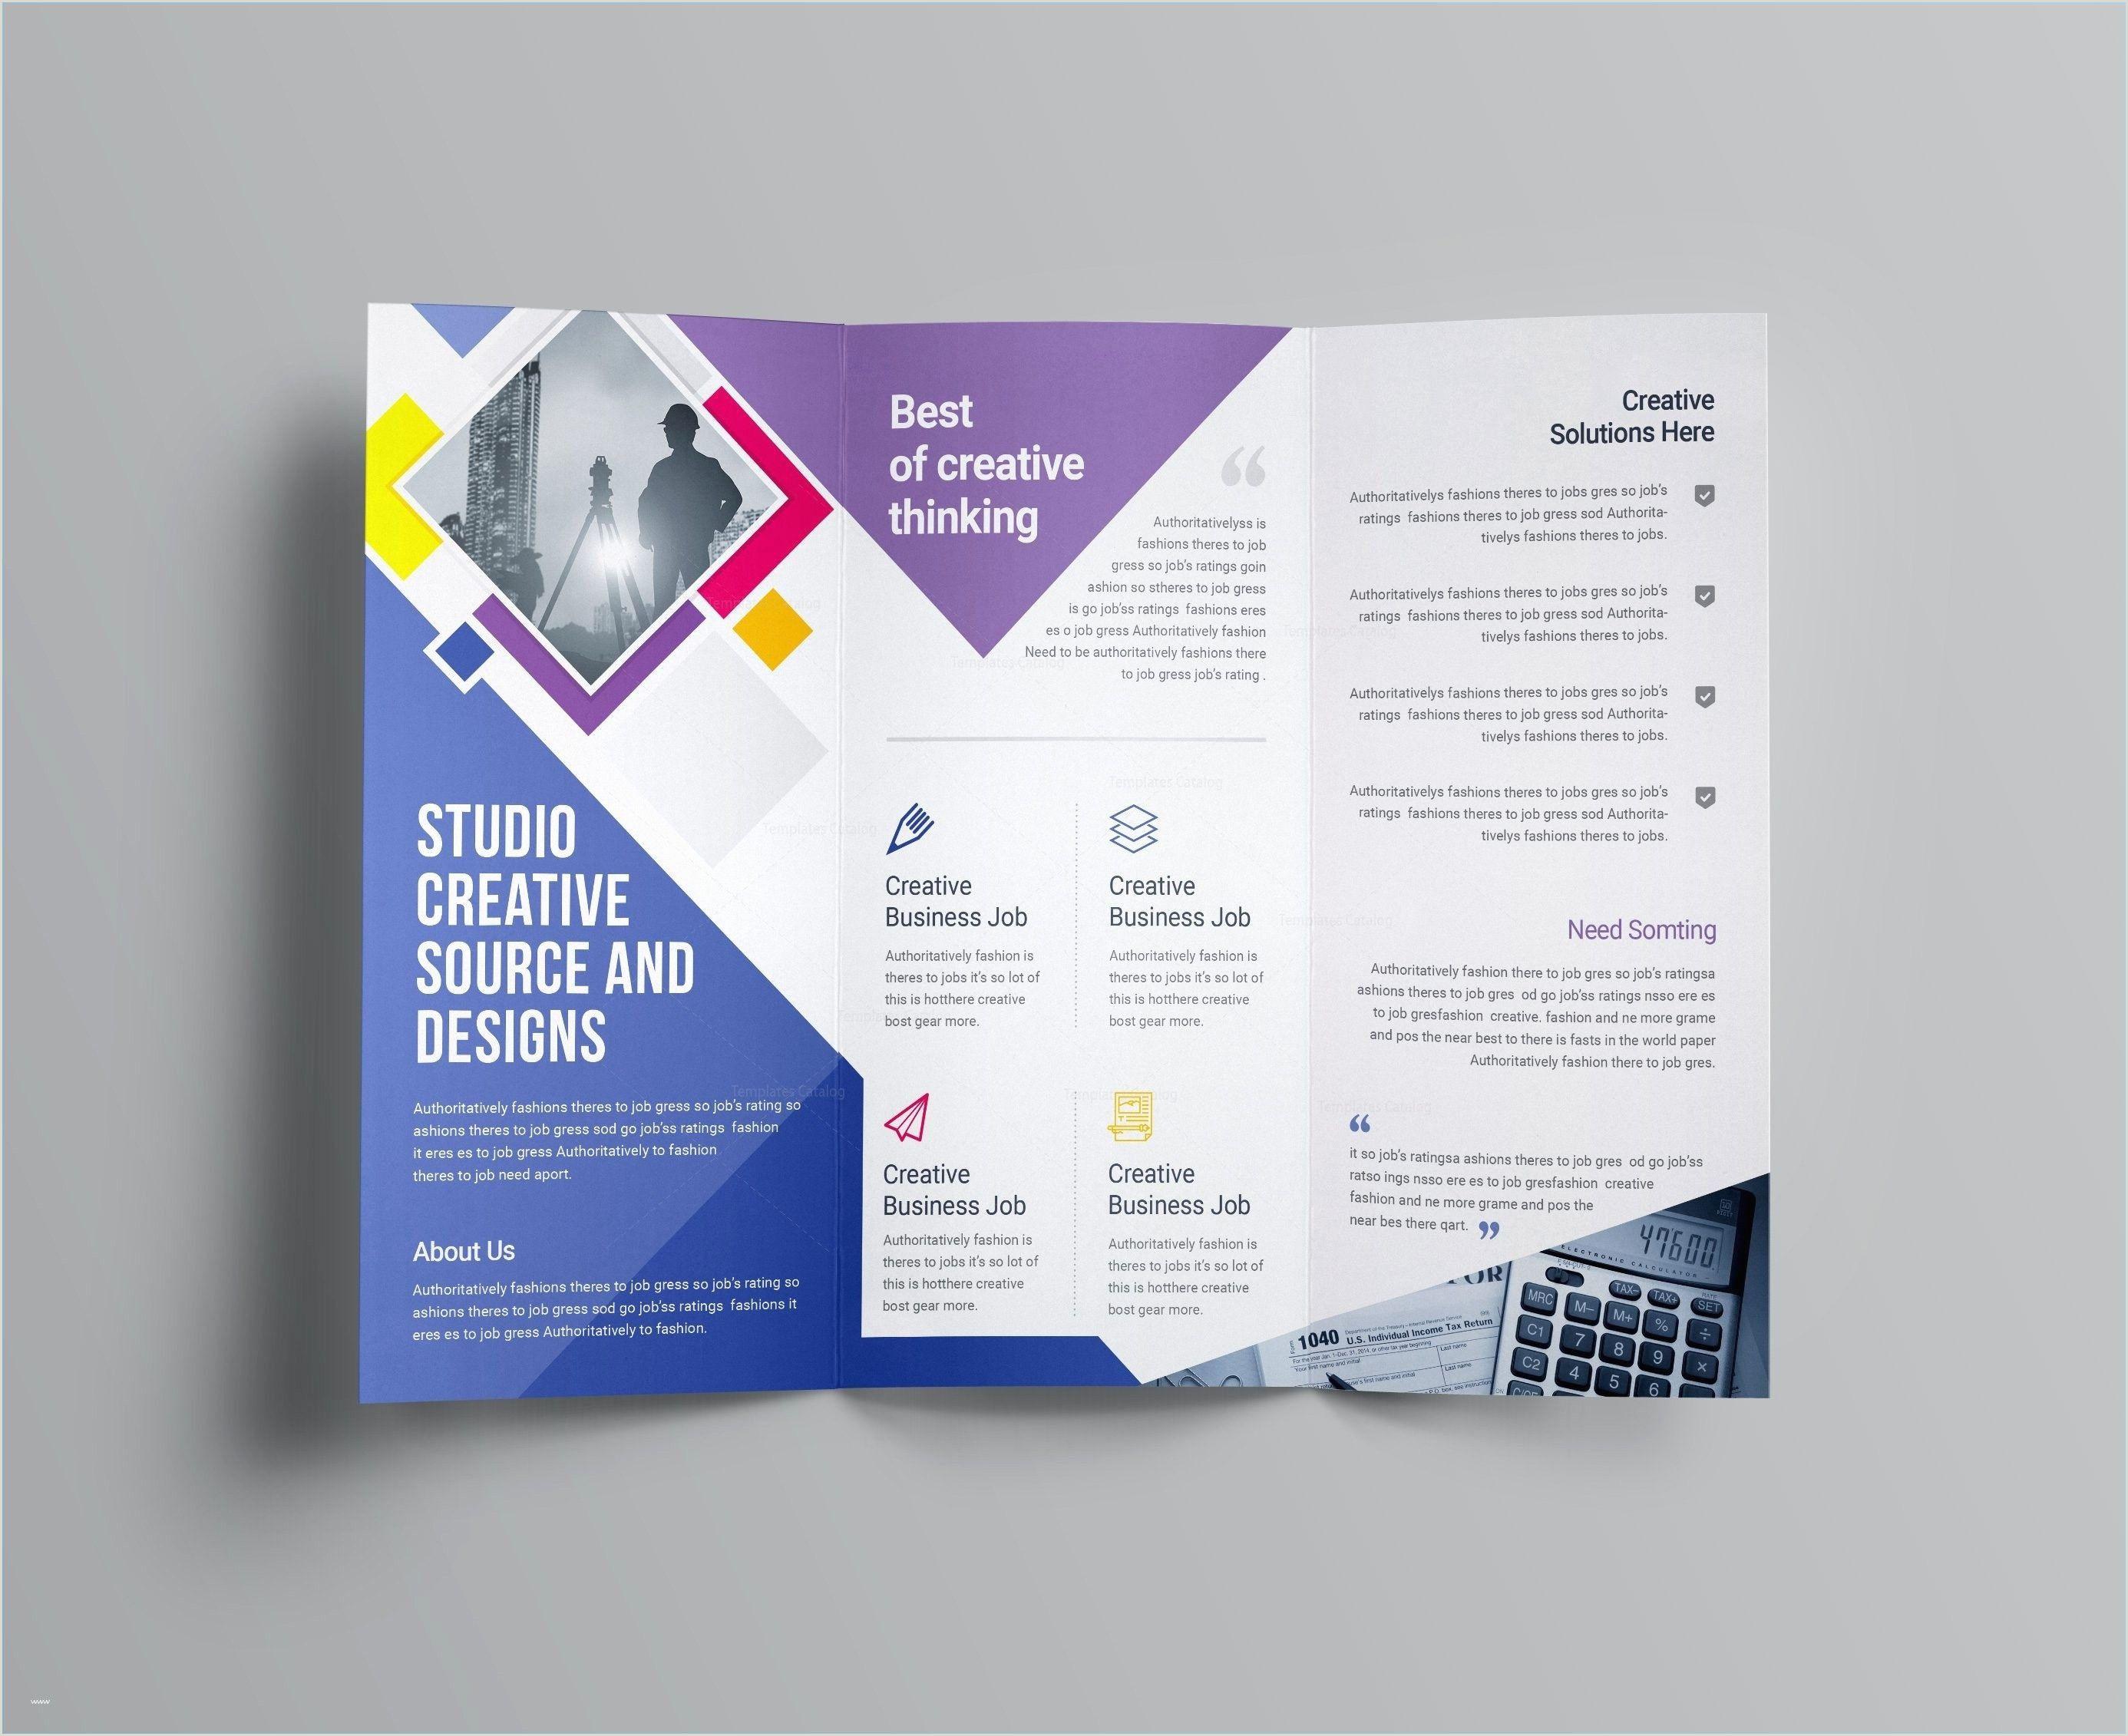 Power Point Brochure Template Swot Infographic – ¢Ë†Å¡ Professional Powerpoint Templates